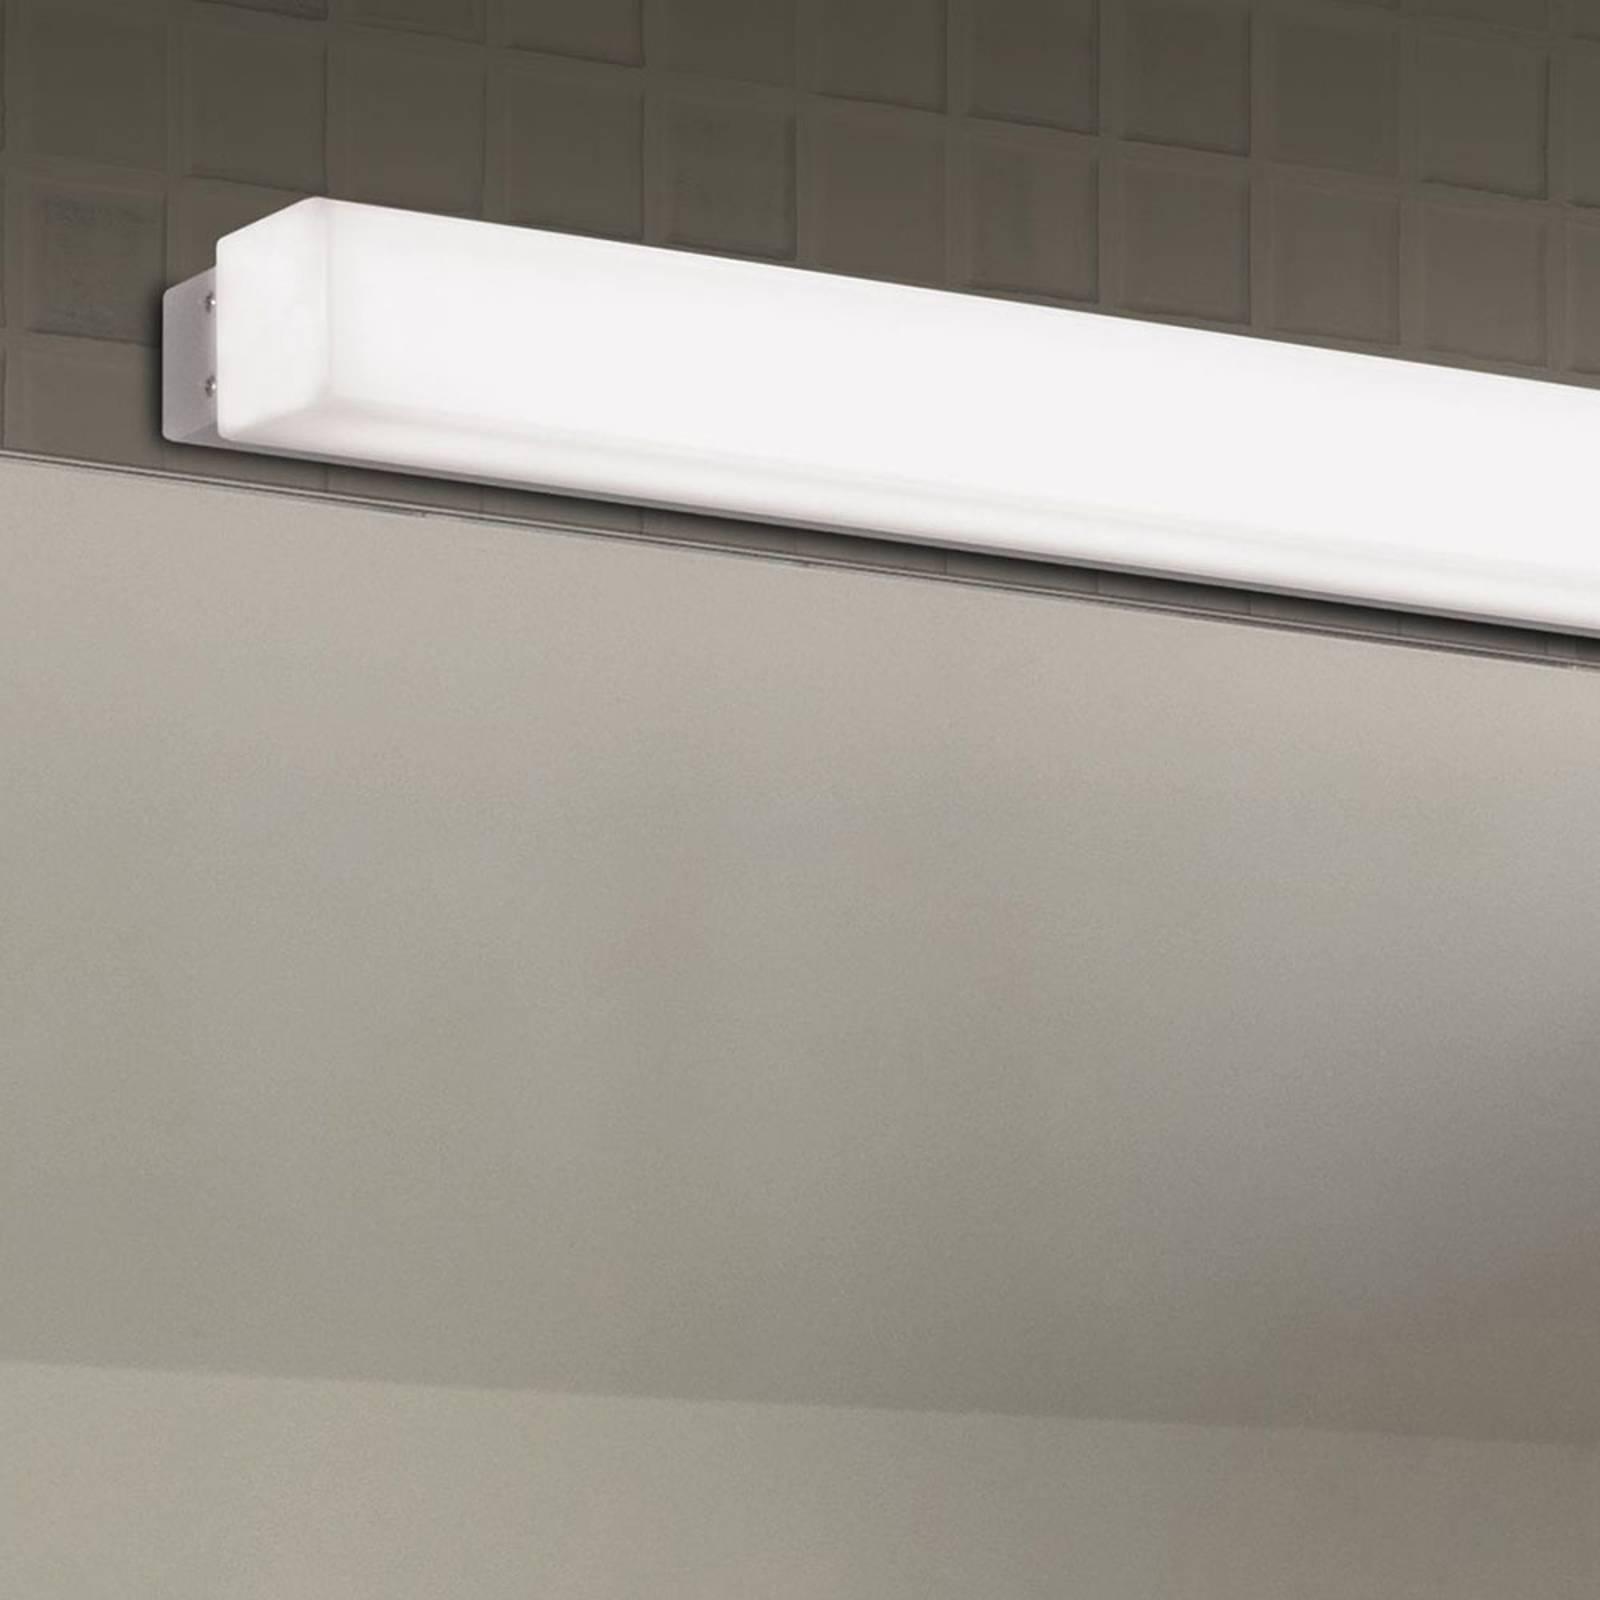 Kylpyhuoneen LED-seinälamppu Box, 3 000 K, L 59 cm